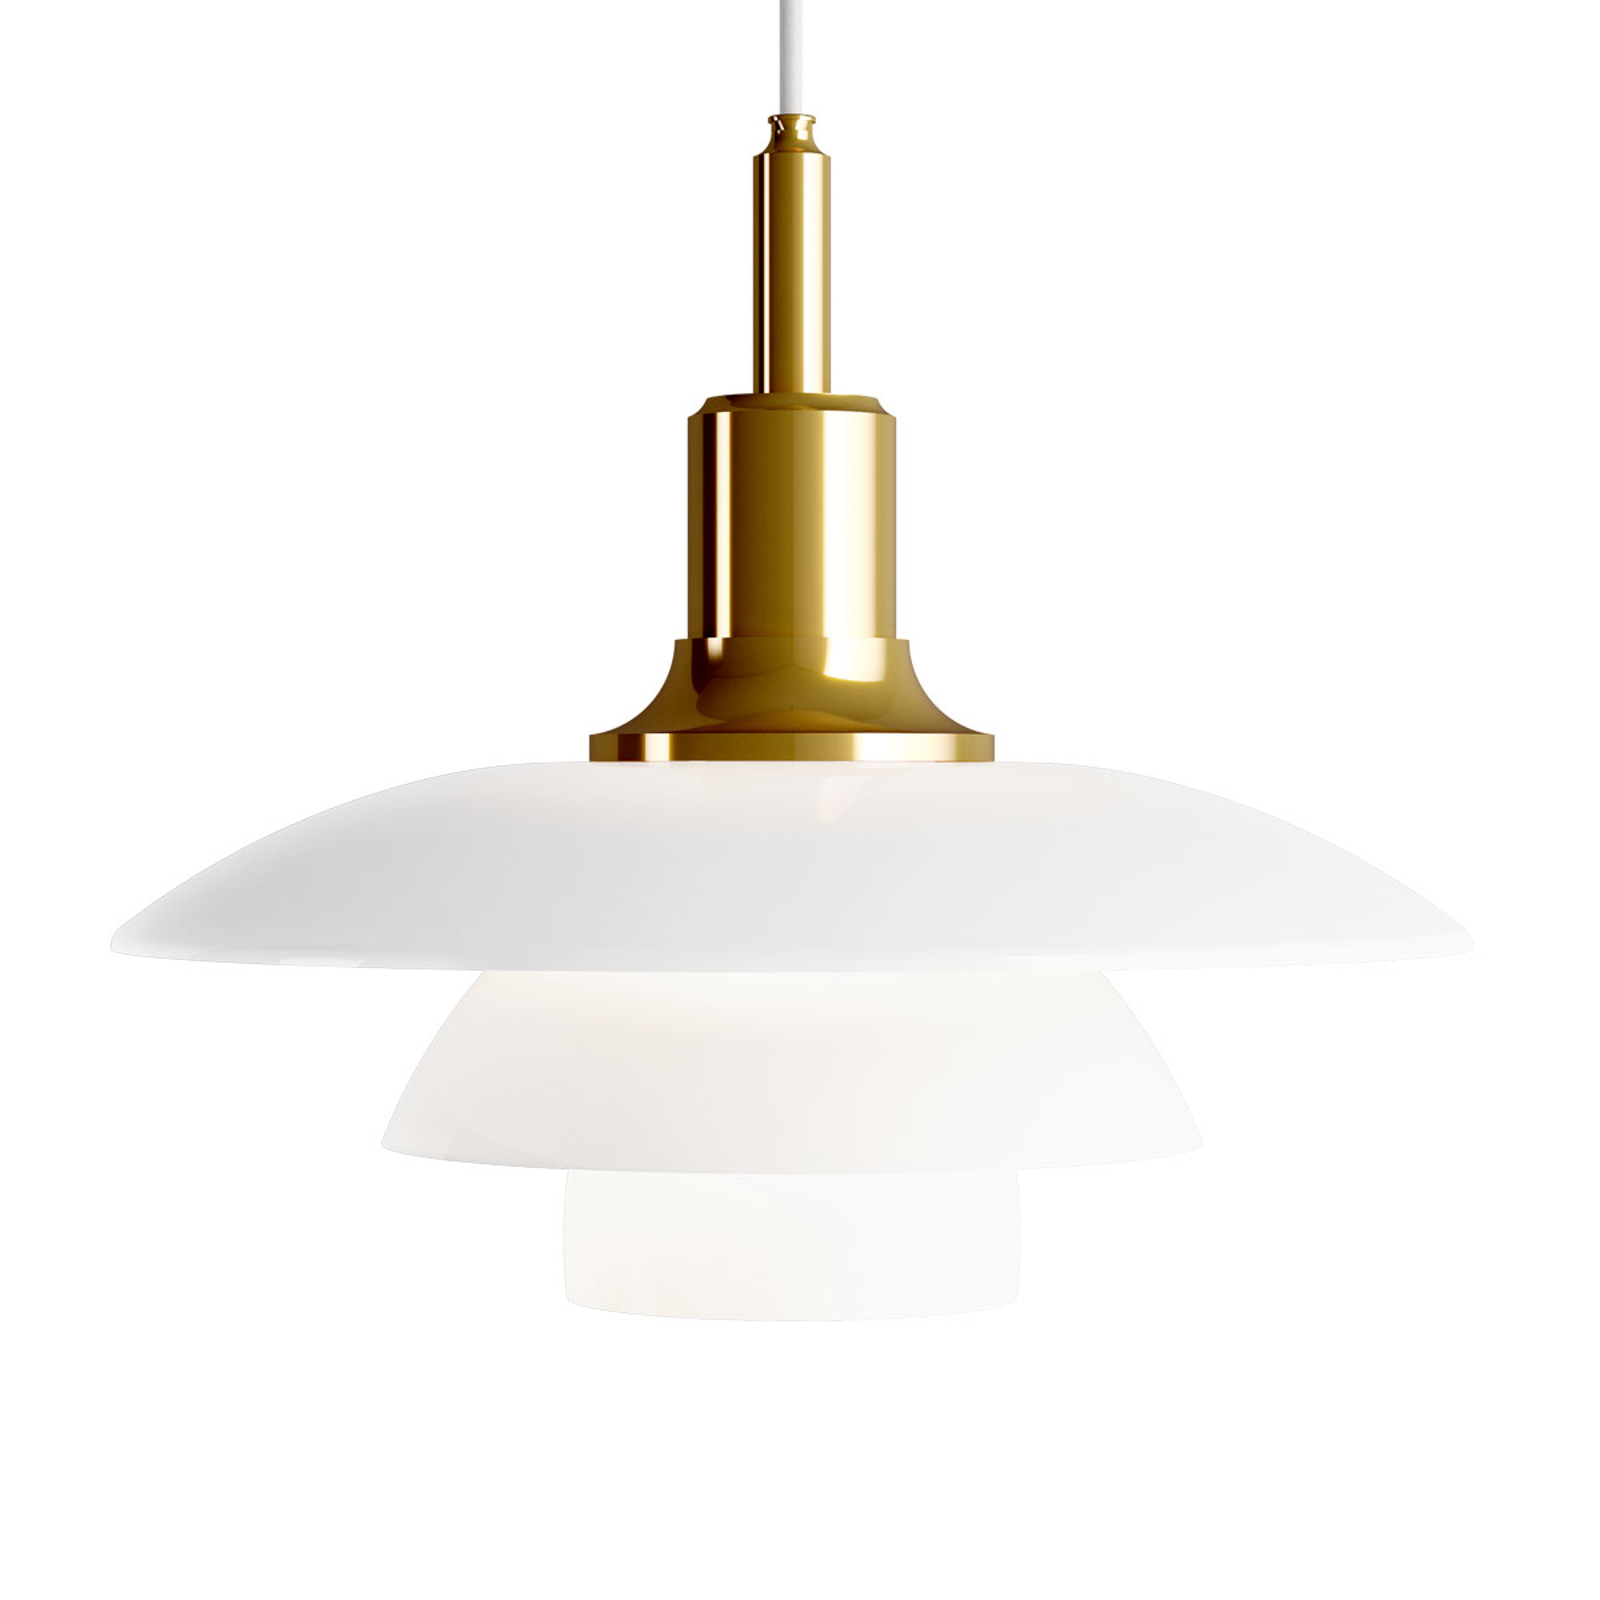 Louis Poulsen PH 3 1/2-3 glashængelampe messing